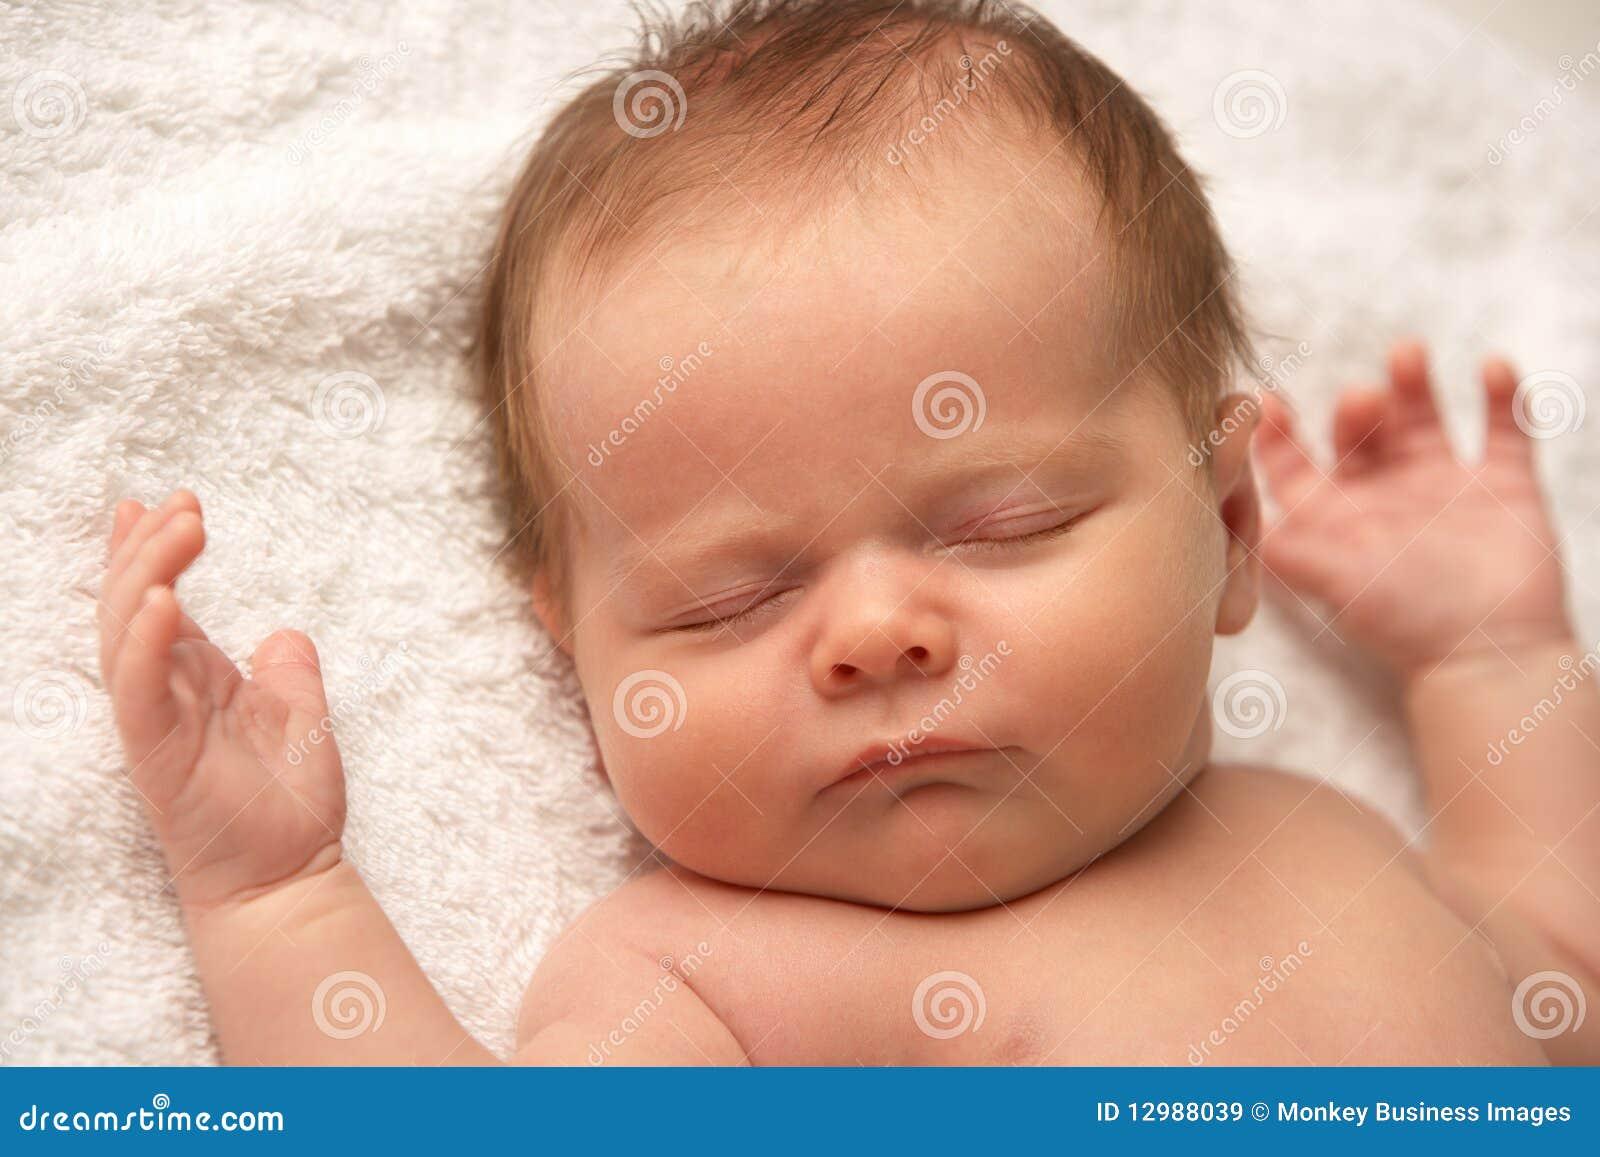 Close Up Of Baby Sleeping Stock Image Image Of Beautiful